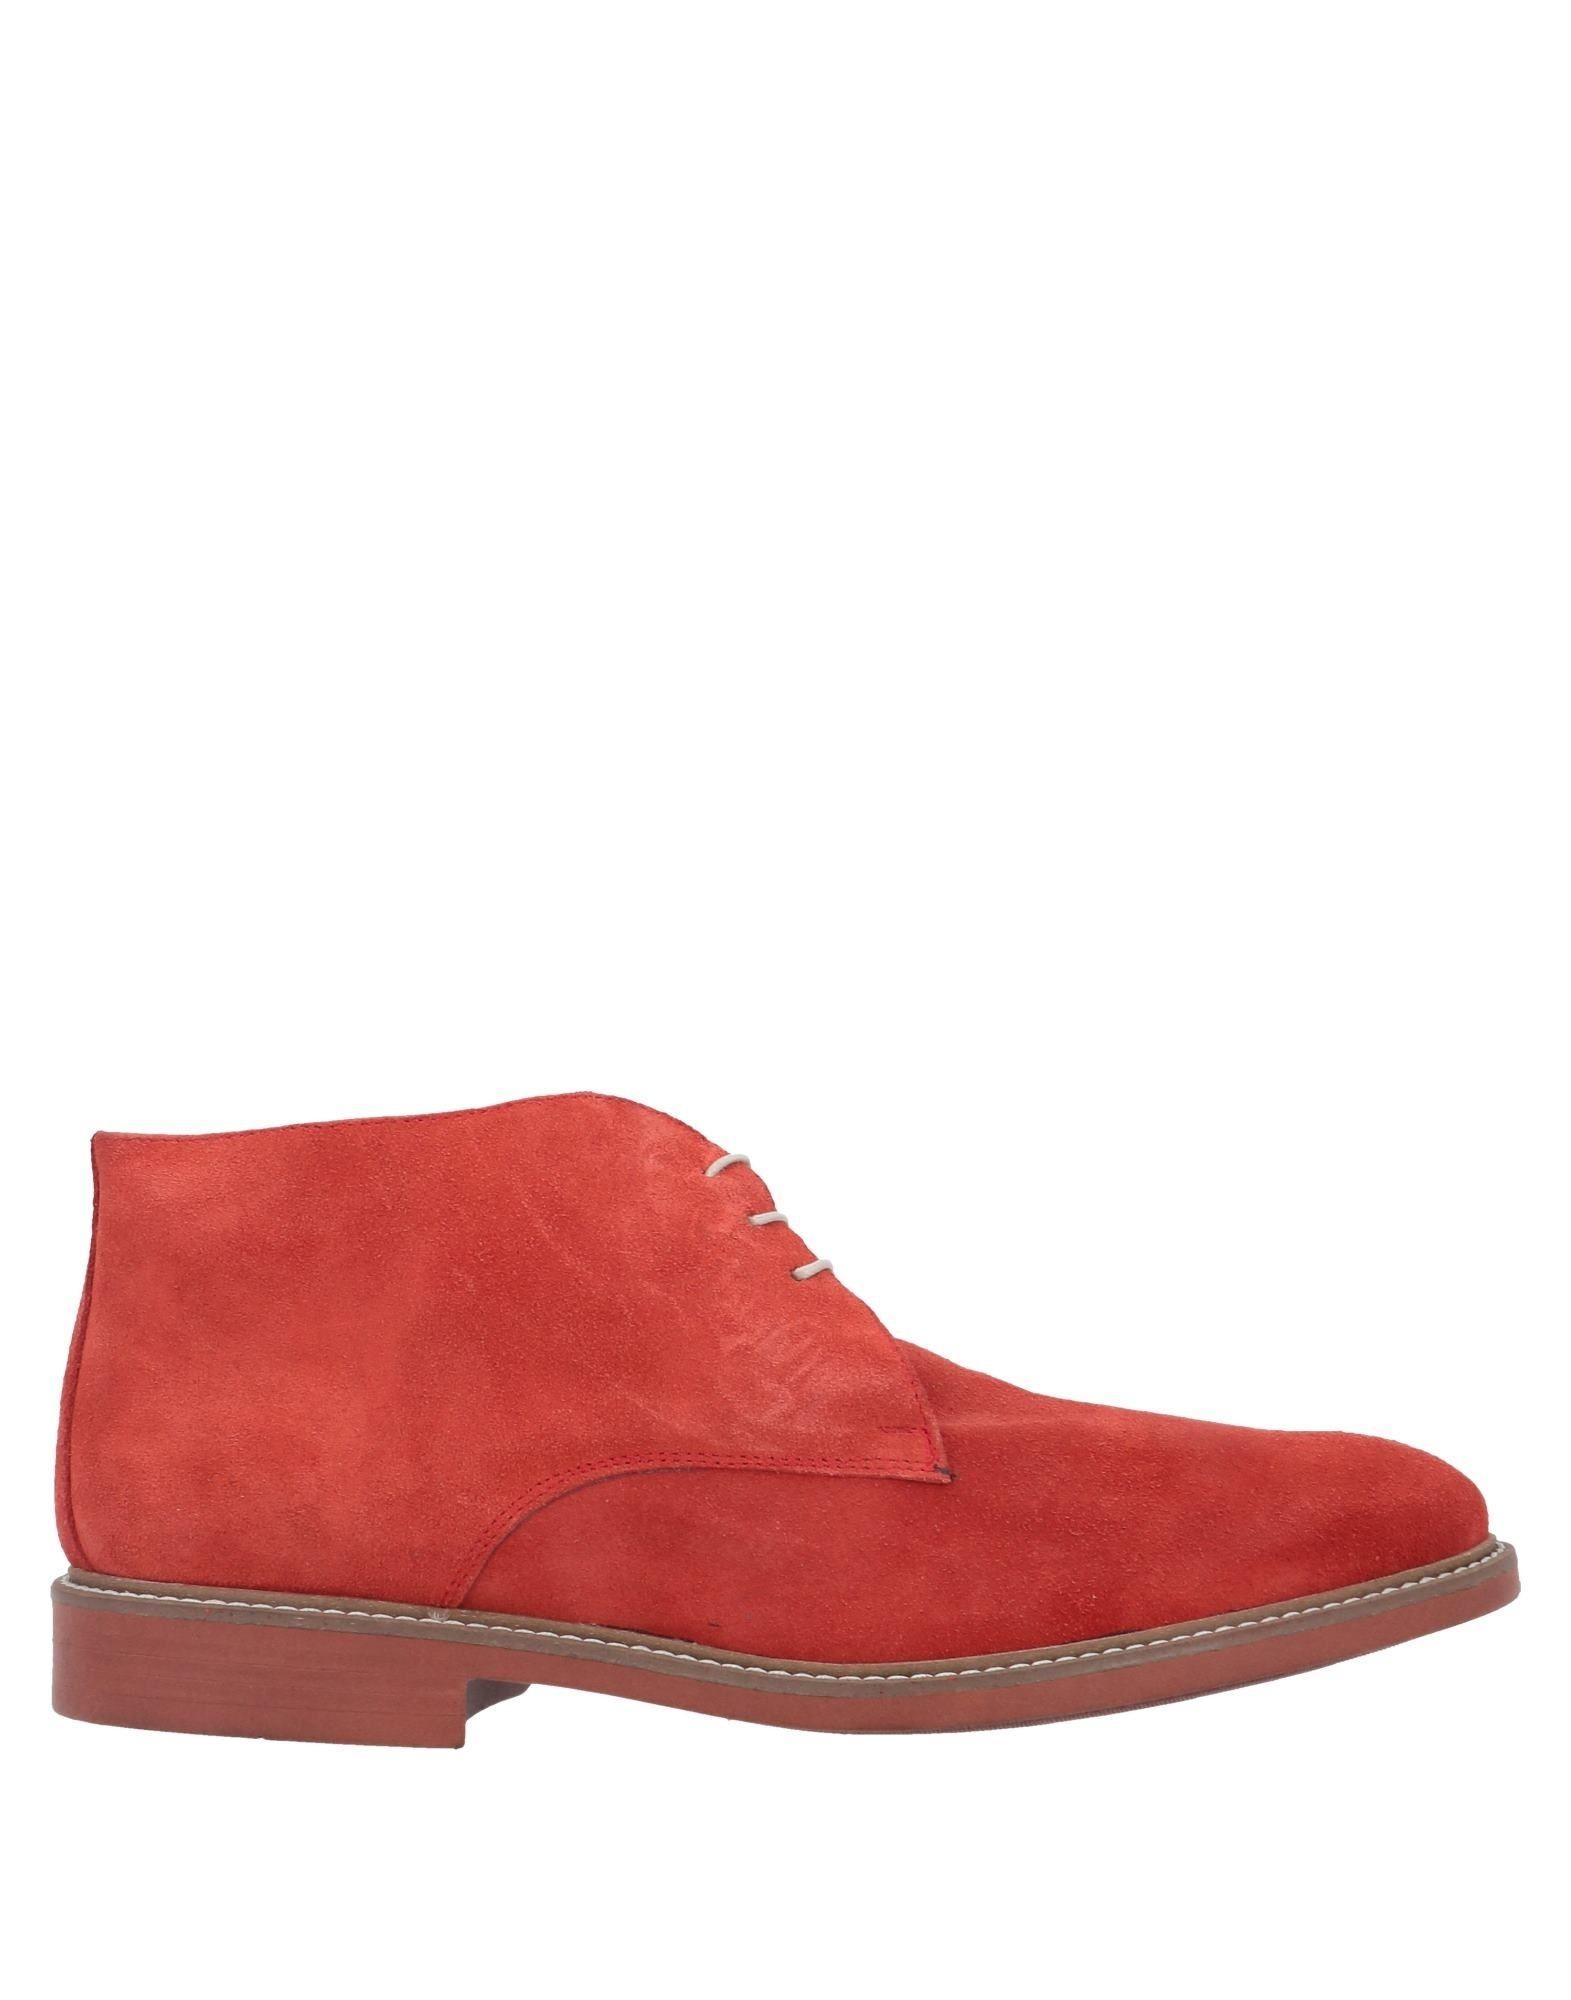 CRISTIANO ROSSANI® Полусапоги и высокие ботинки cristiano rossani® мокасины